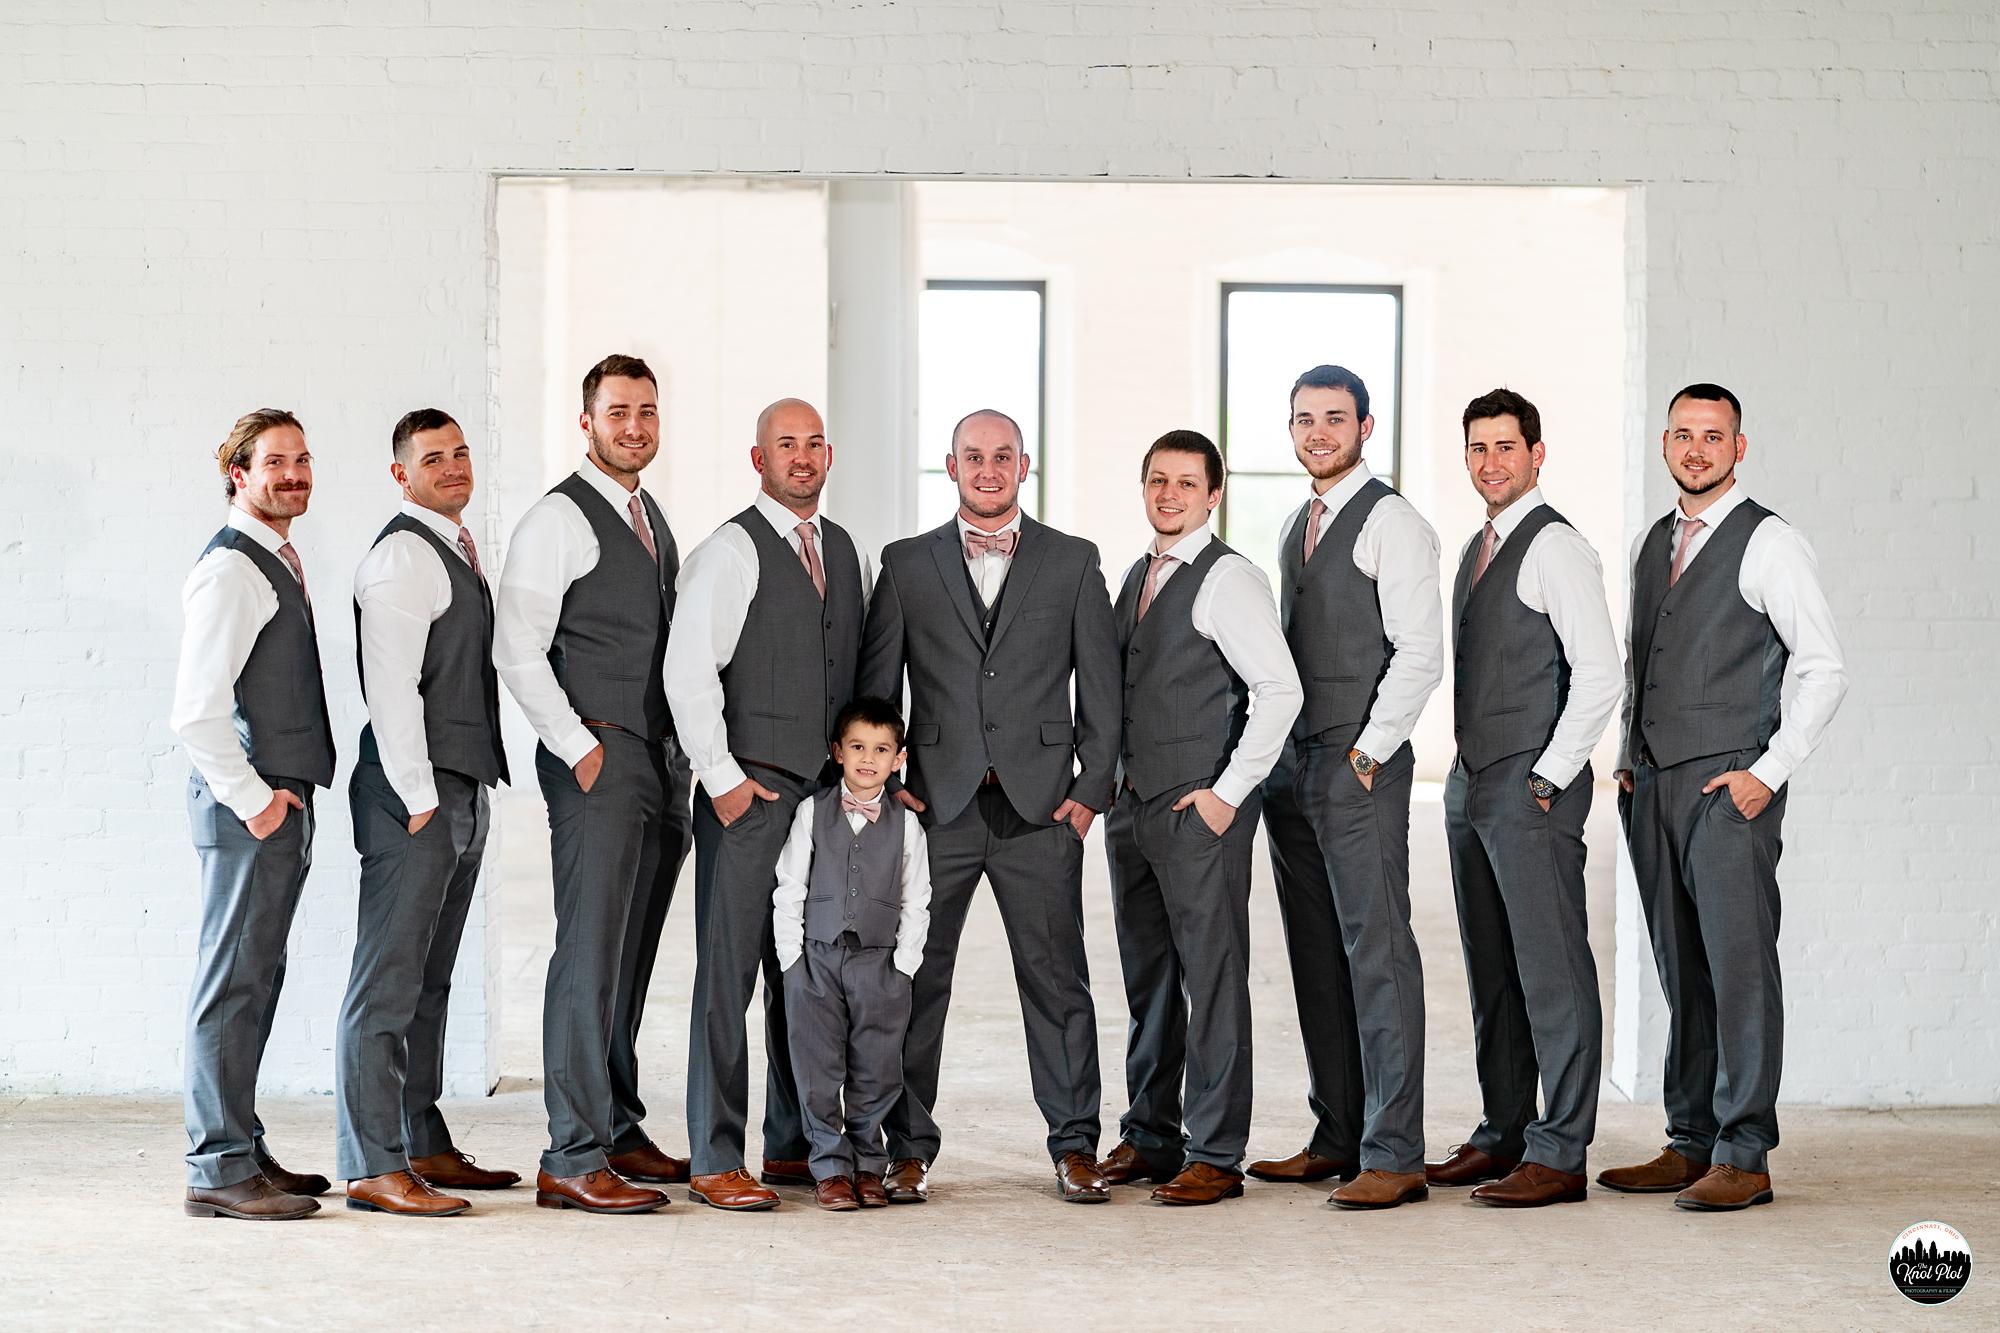 Strietmann-Penthaus-OTR-Cincinnati-Wedding-Photography-10.jpg